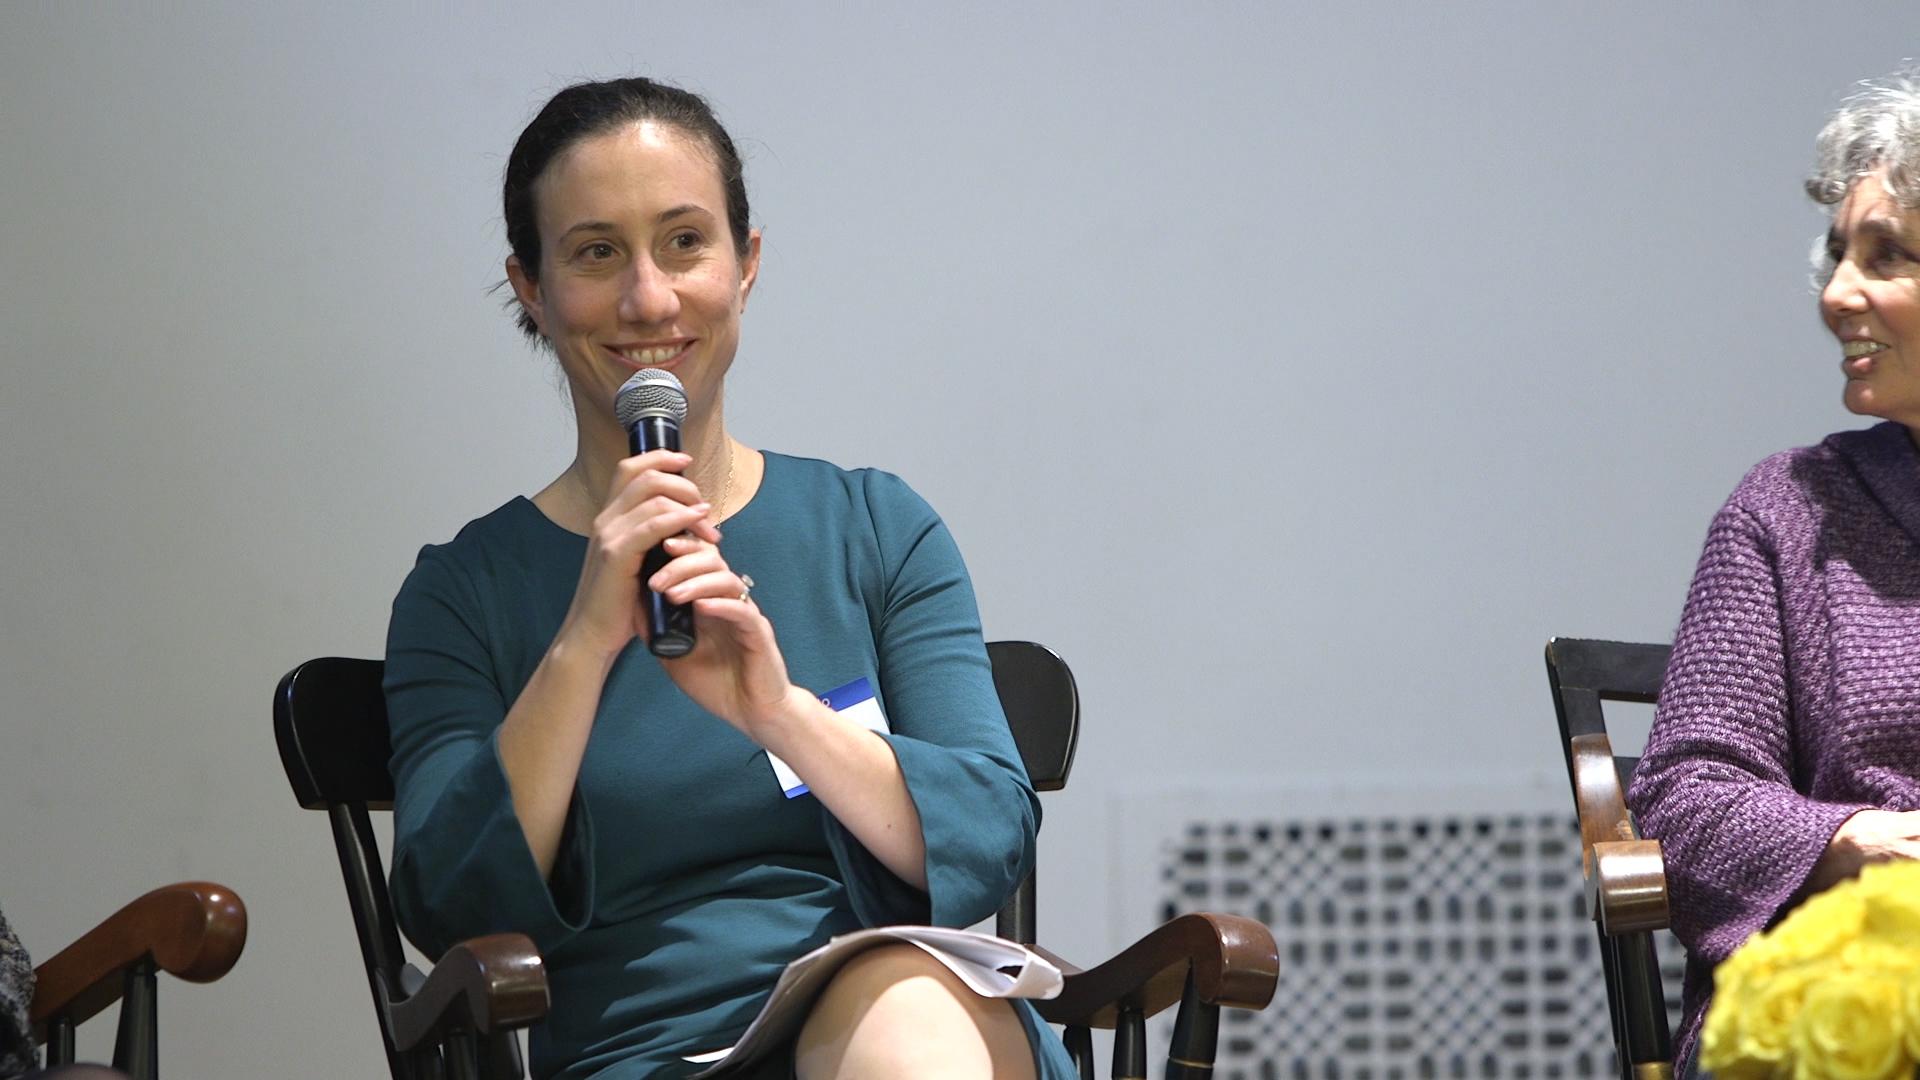 Miriam Heyman